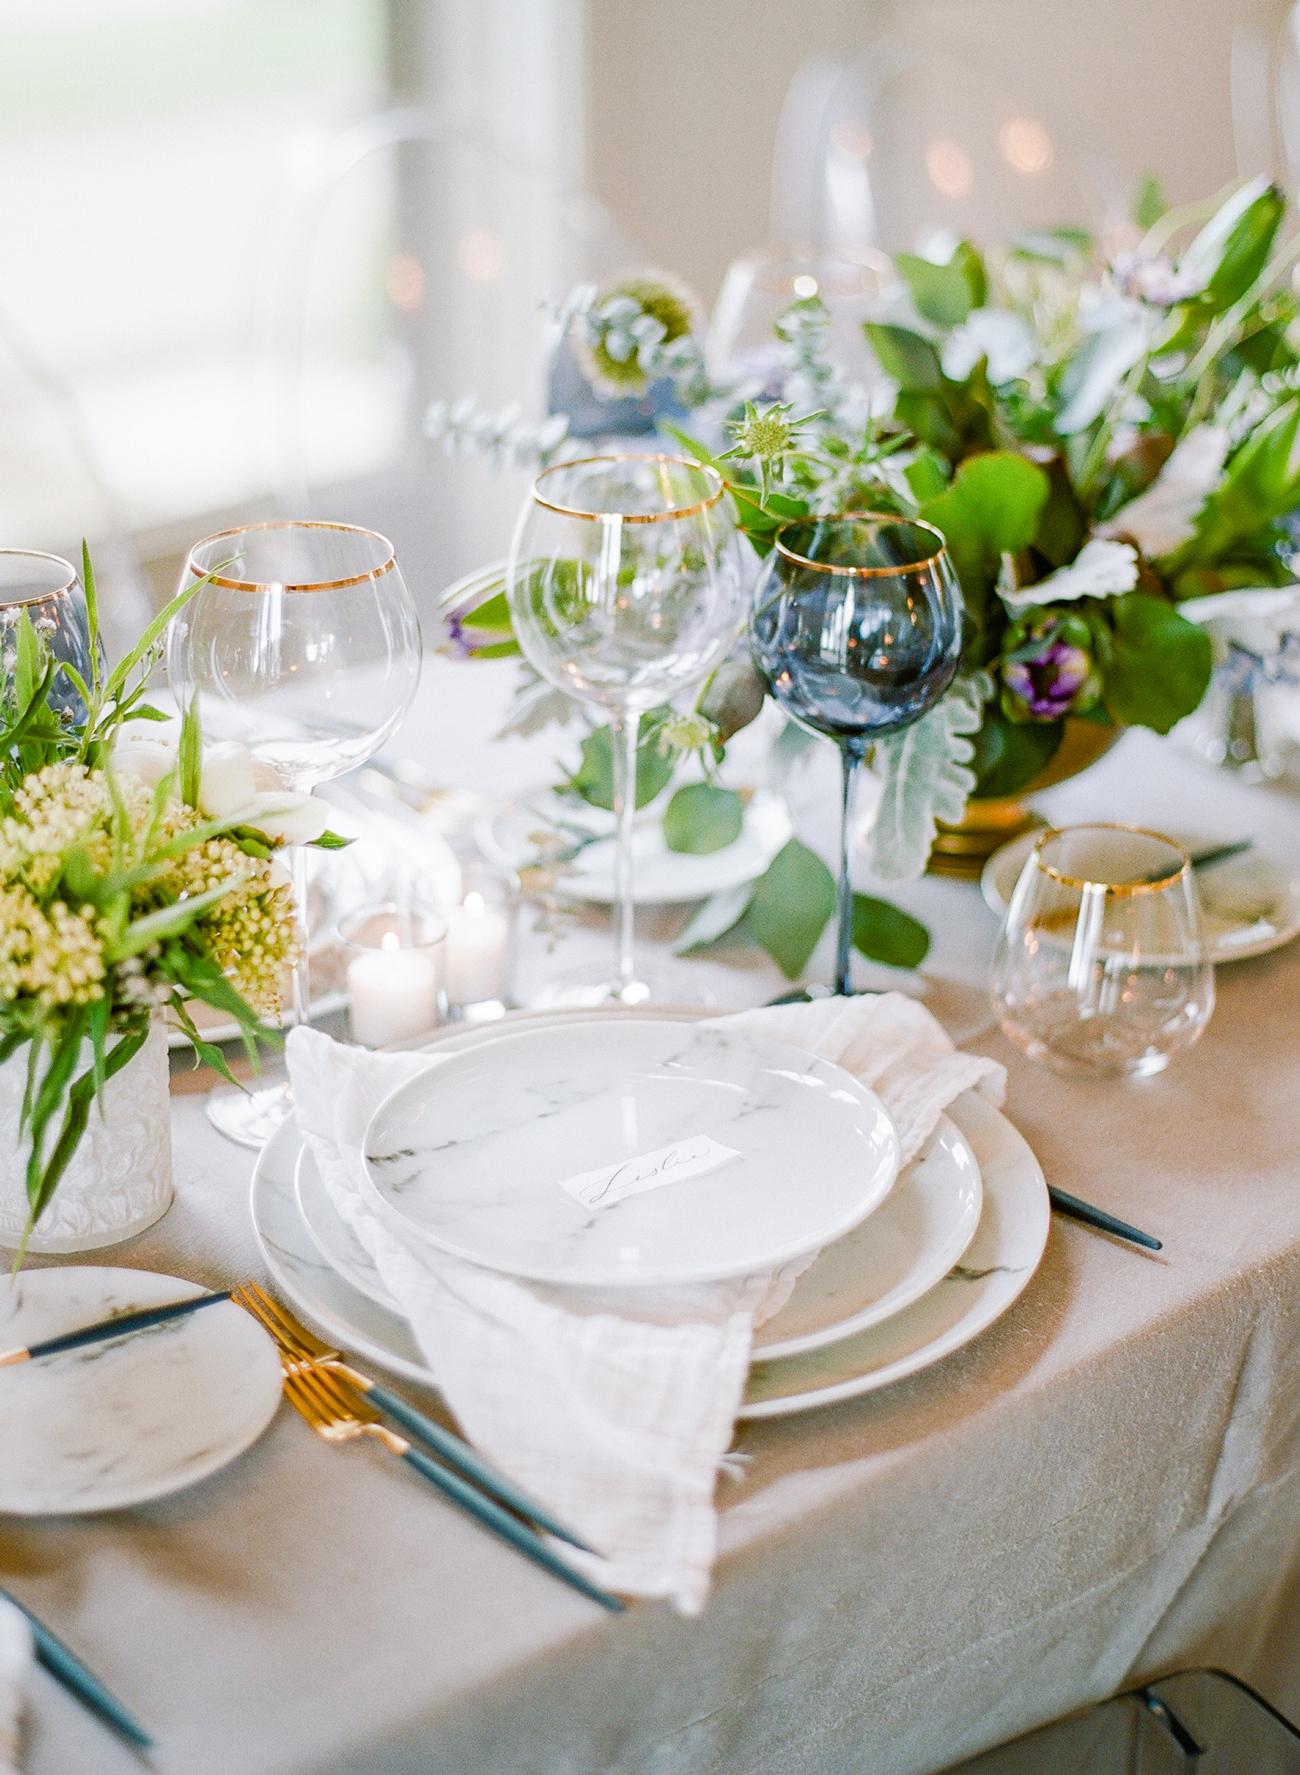 wedding reception napkin folds triangular fold beneath marbled plate